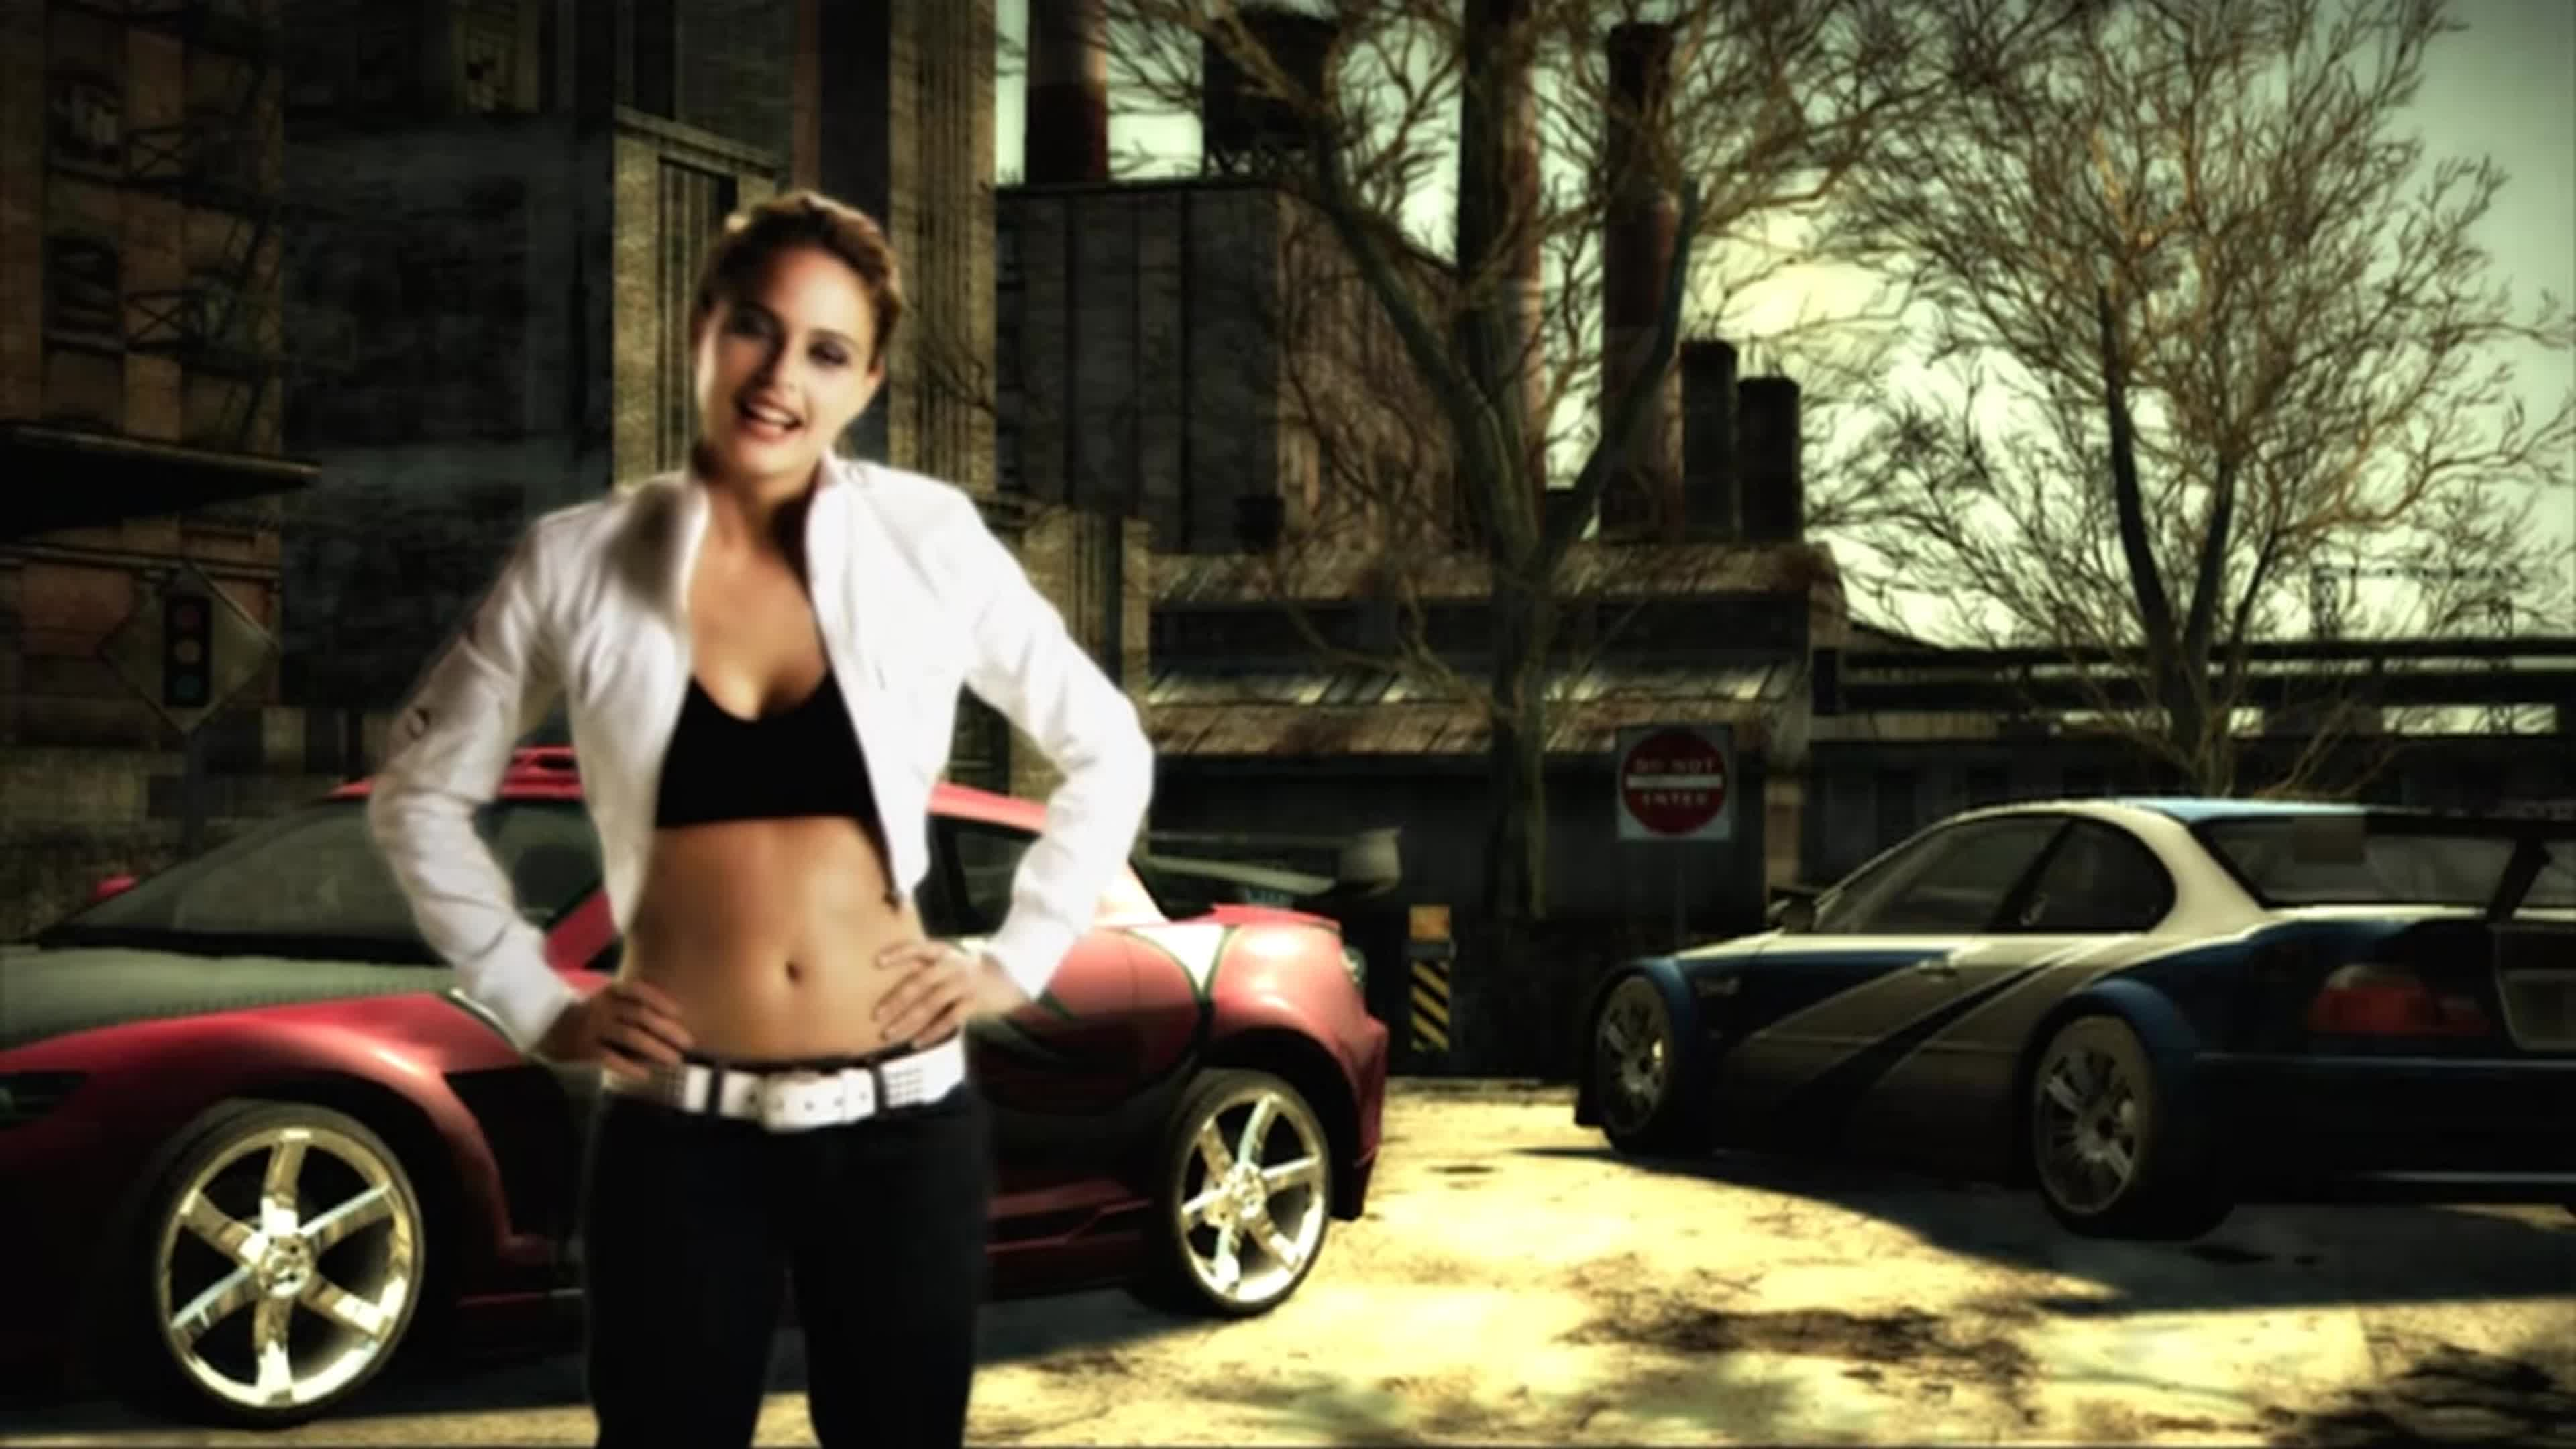 Gaming, NFSMW, Razor, Szene, Tzeff NL, cena, escena, nfs, popular, sahne, scena, scène, viral, сцена, مشاهد, シーン, 现场, 컷씬, Need For Speed: Most Wanted 2005 - All Cutscenes [4K, 60fps] GIFs